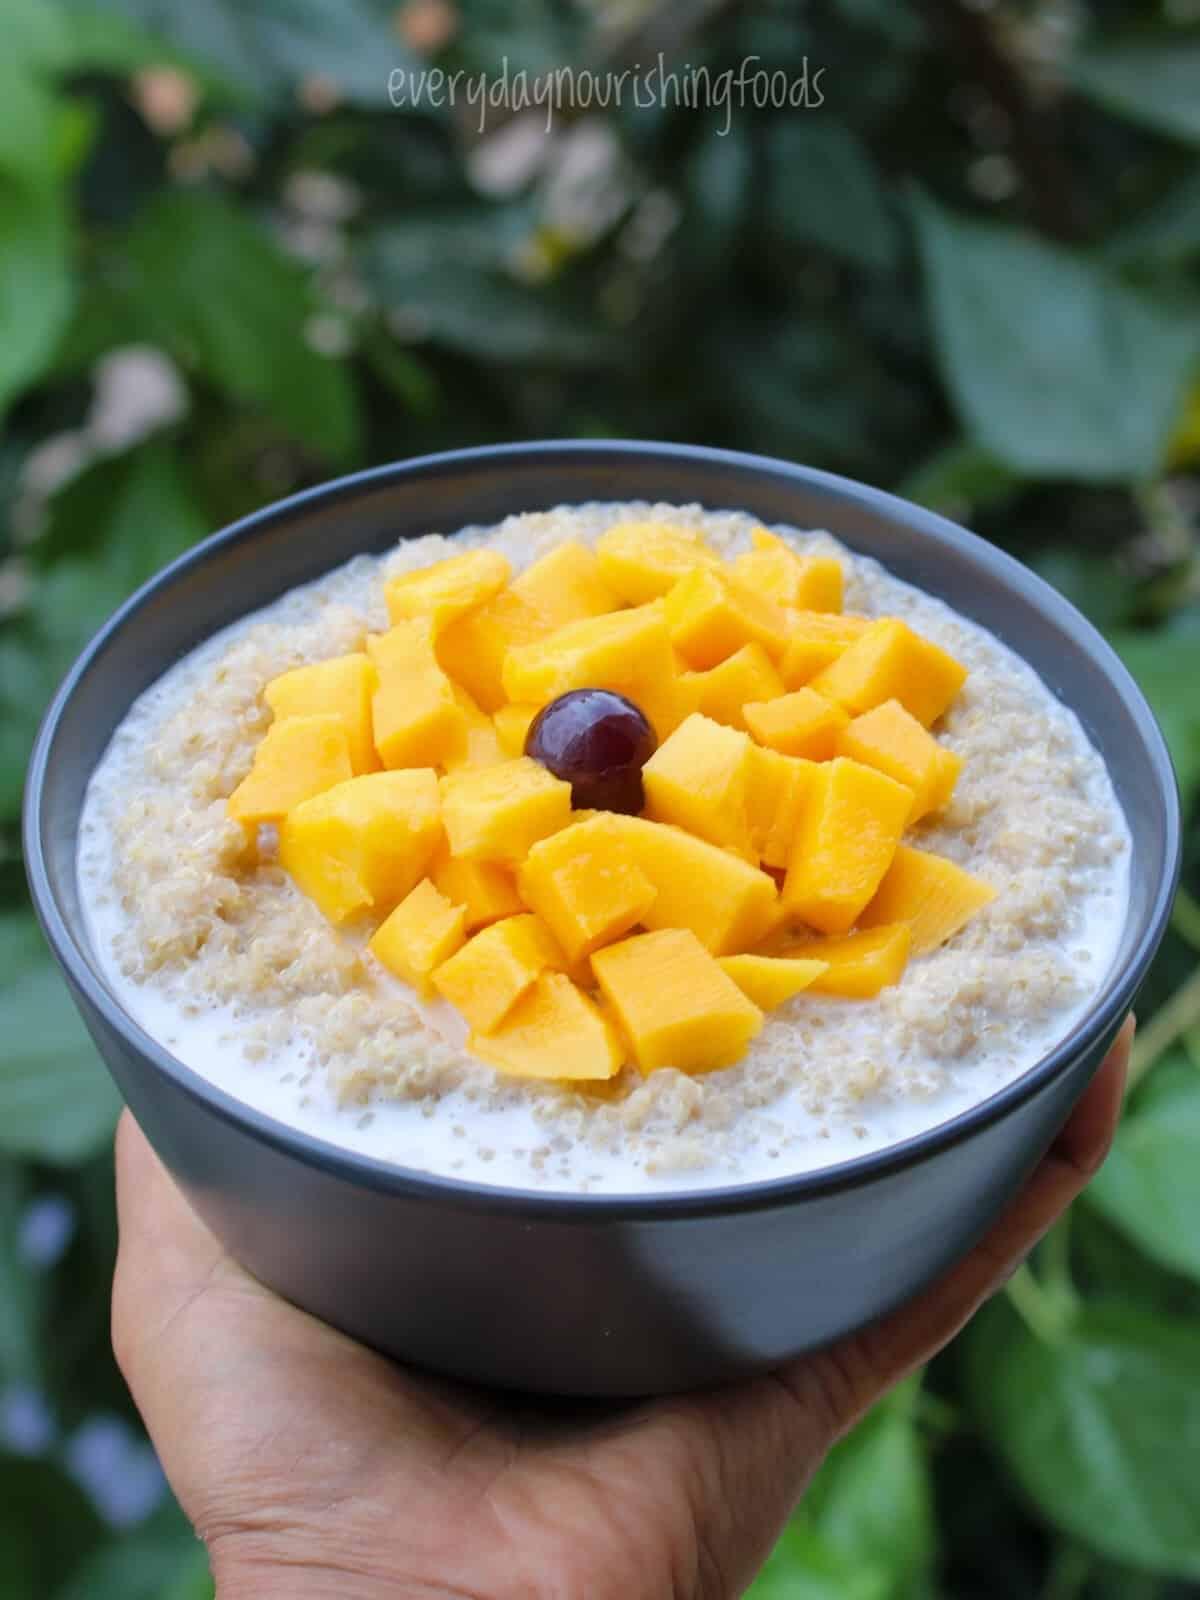 quinoa breakfast porridge in a bowl